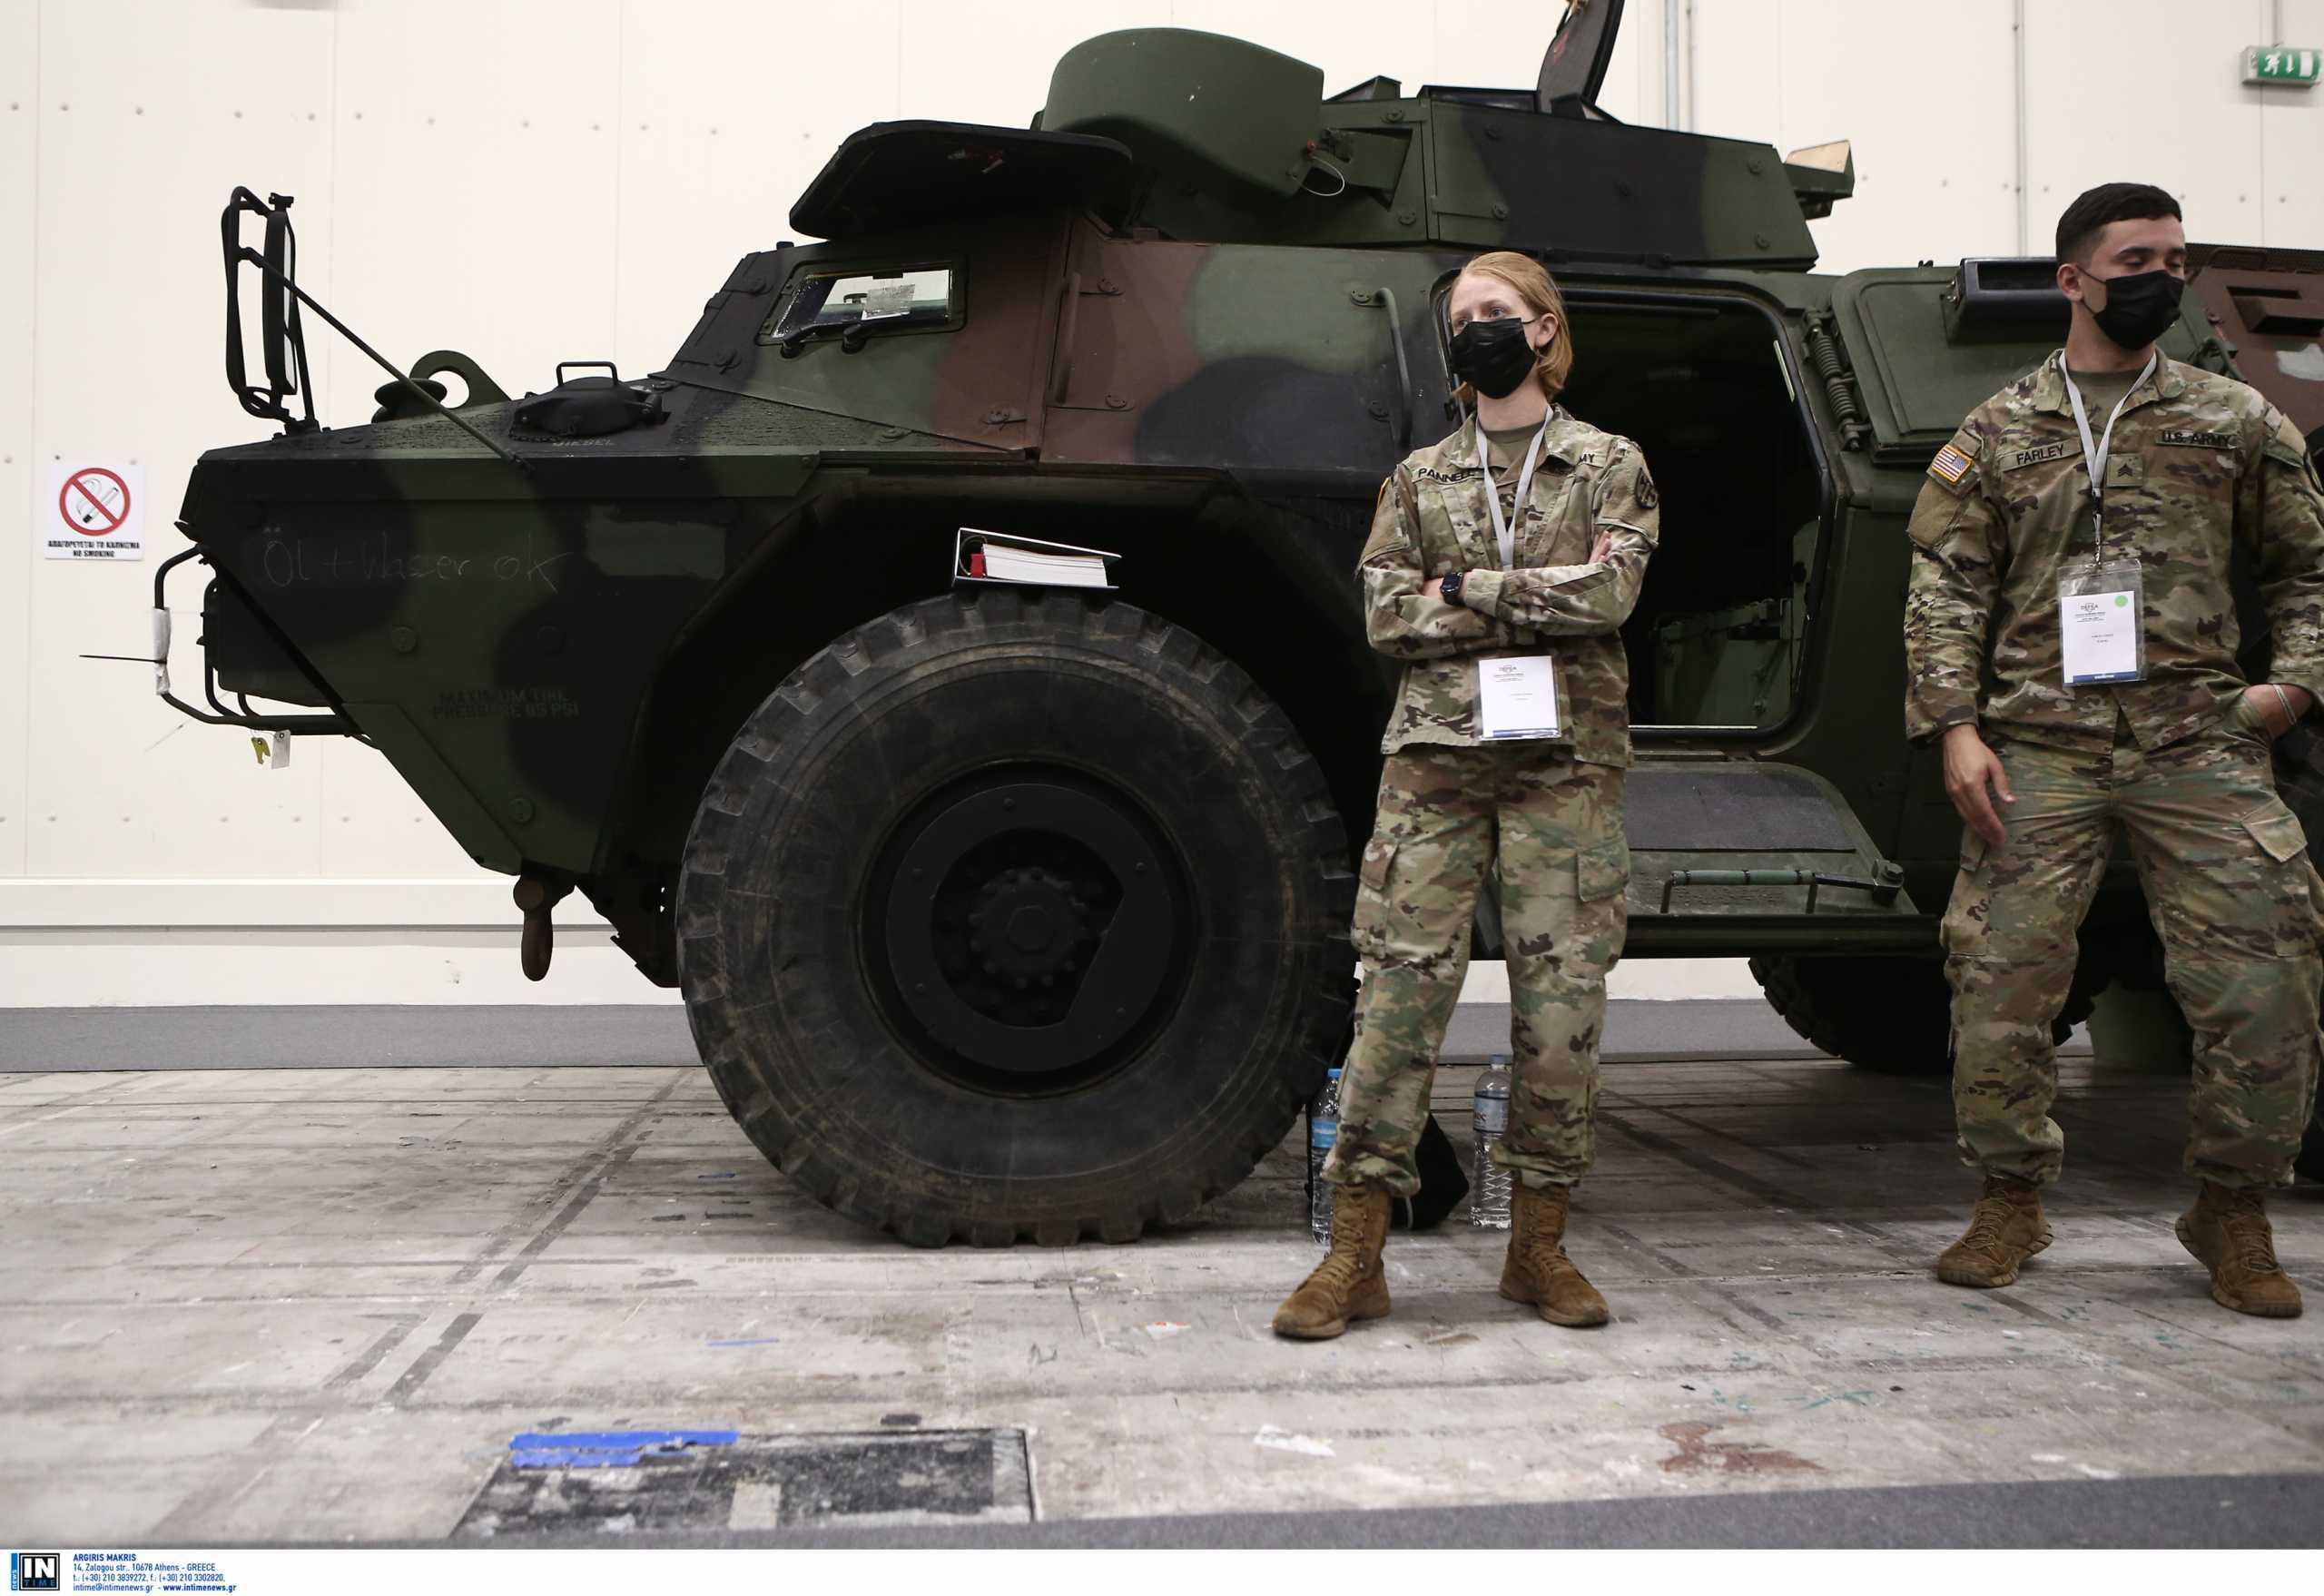 DEFEA 2021: Επίσκεψη μελών της Επιτροπής Εθνικής Άμυνας και Εξωτερικών Υποθέσεων της Βουλής